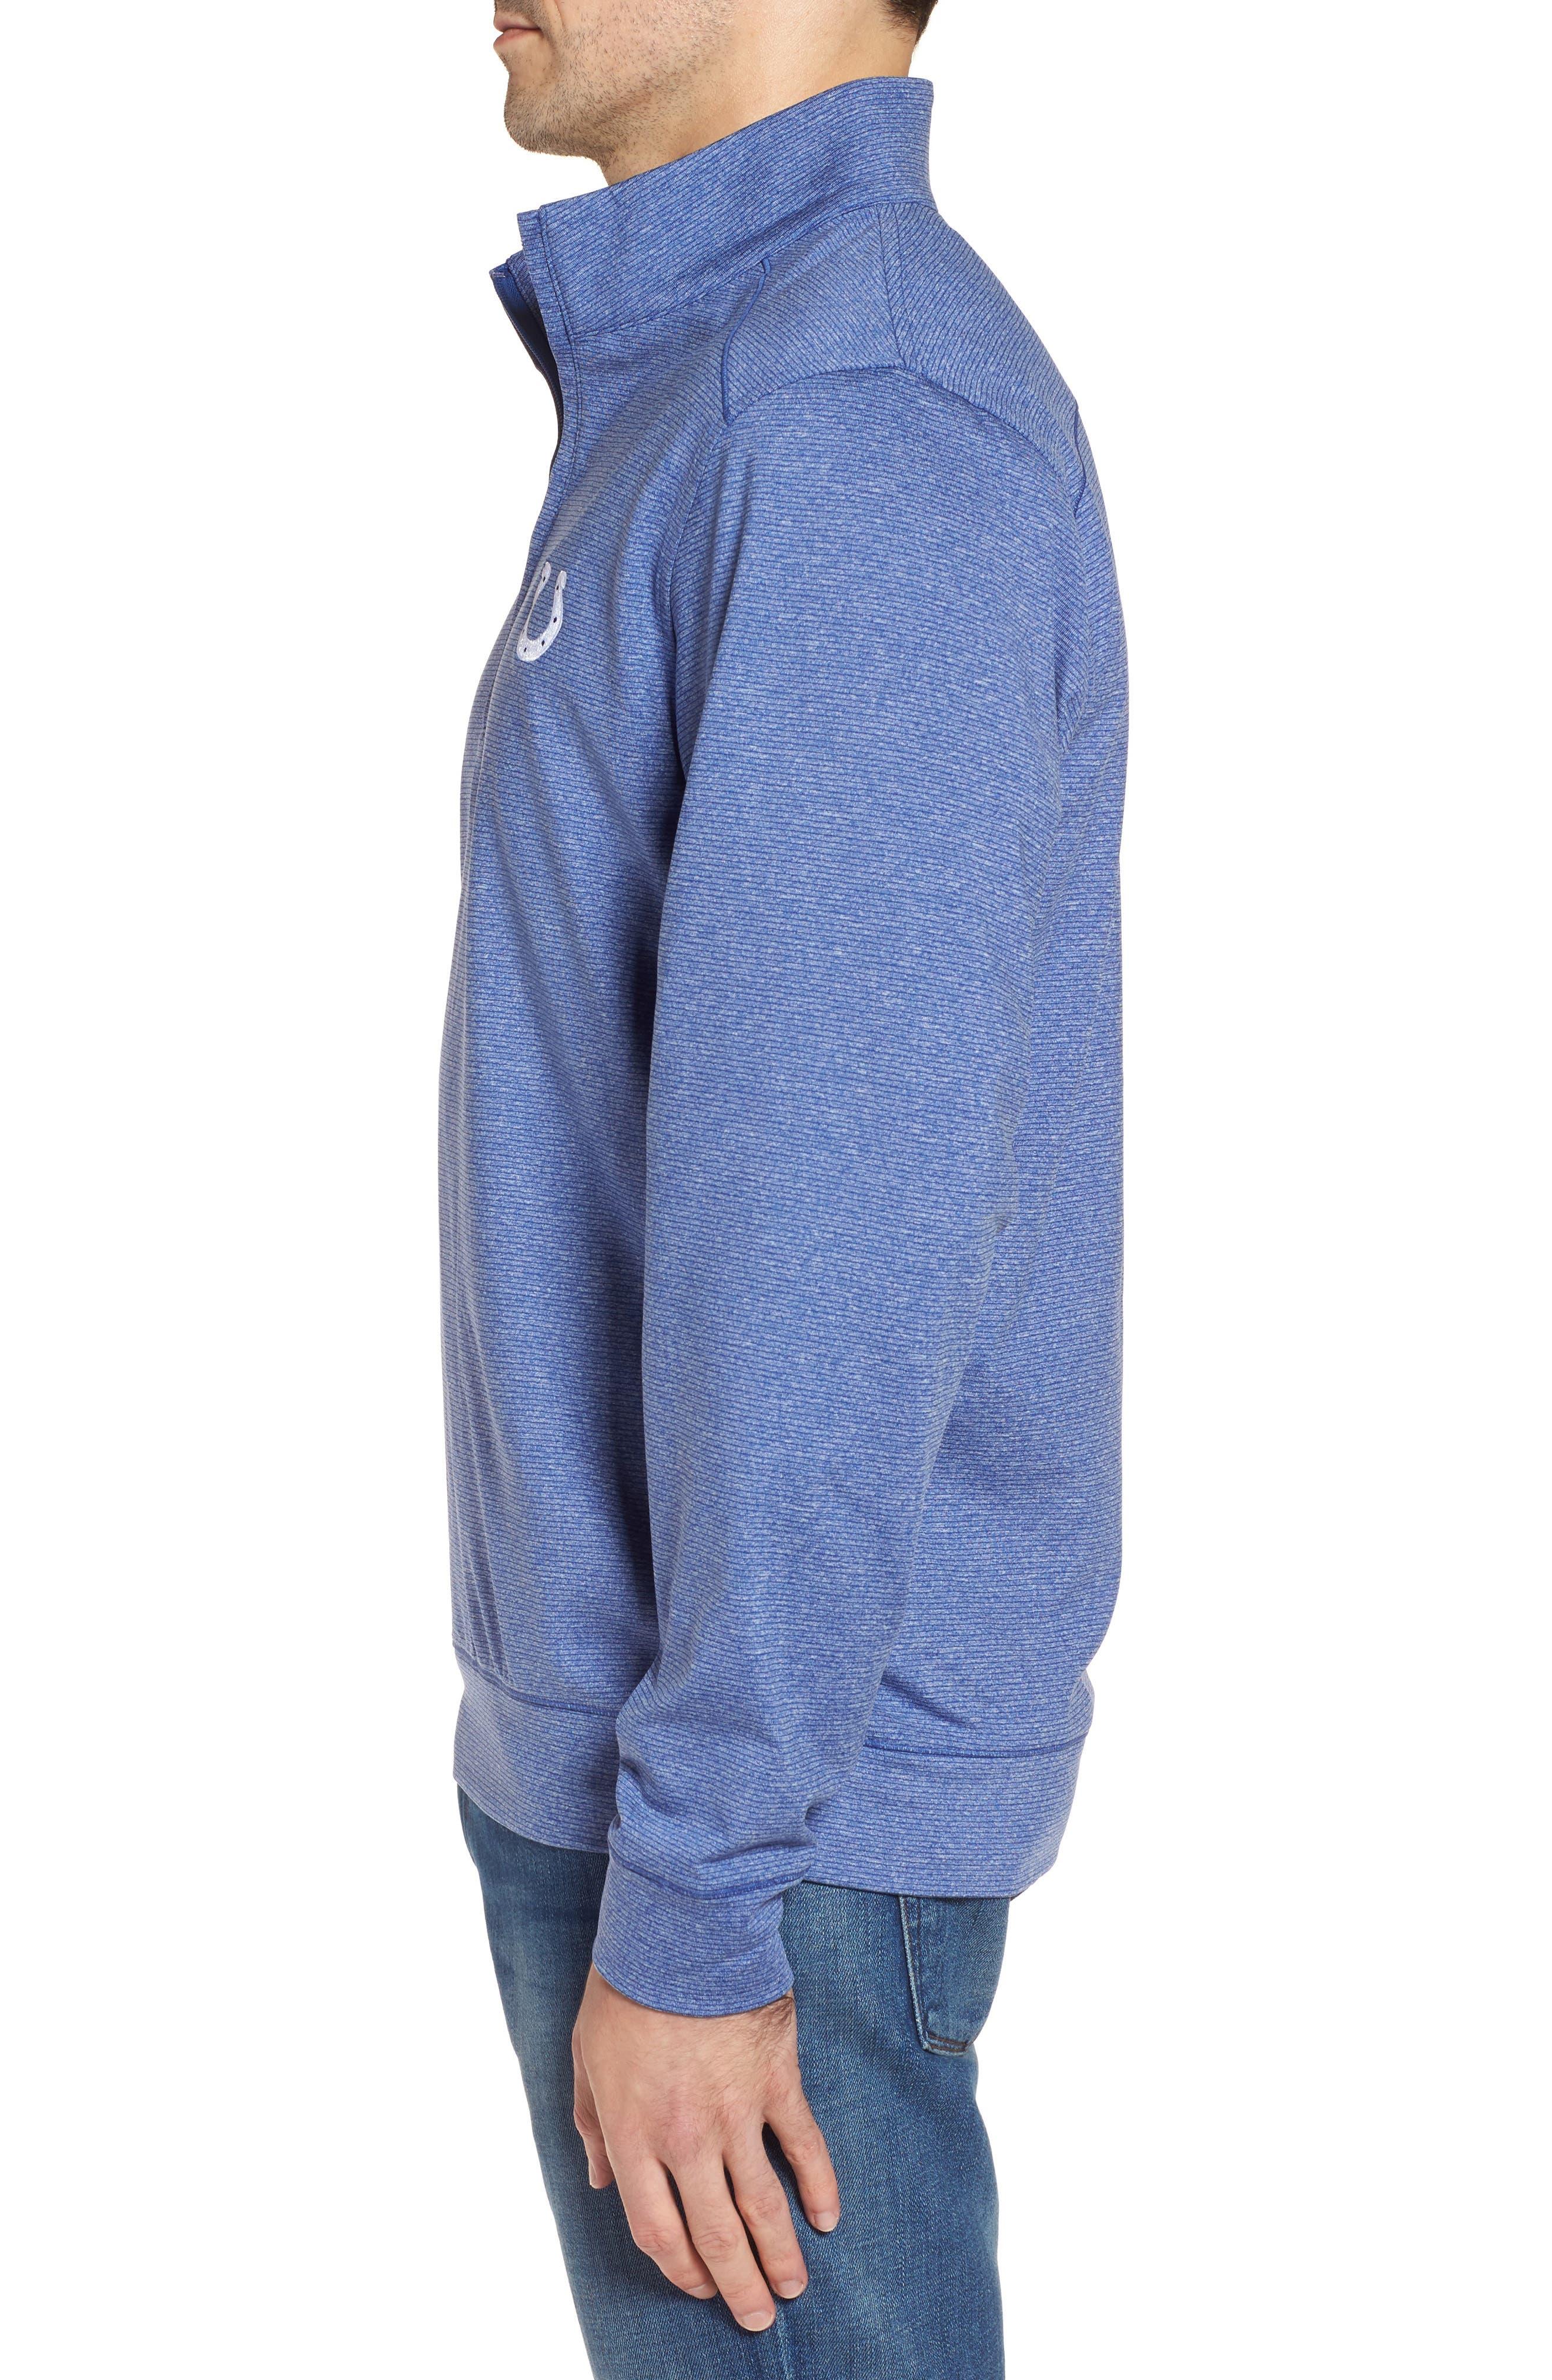 Shoreline - Indianapolis Colts Half Zip Pullover,                             Alternate thumbnail 3, color,                             Tour Blue Heather